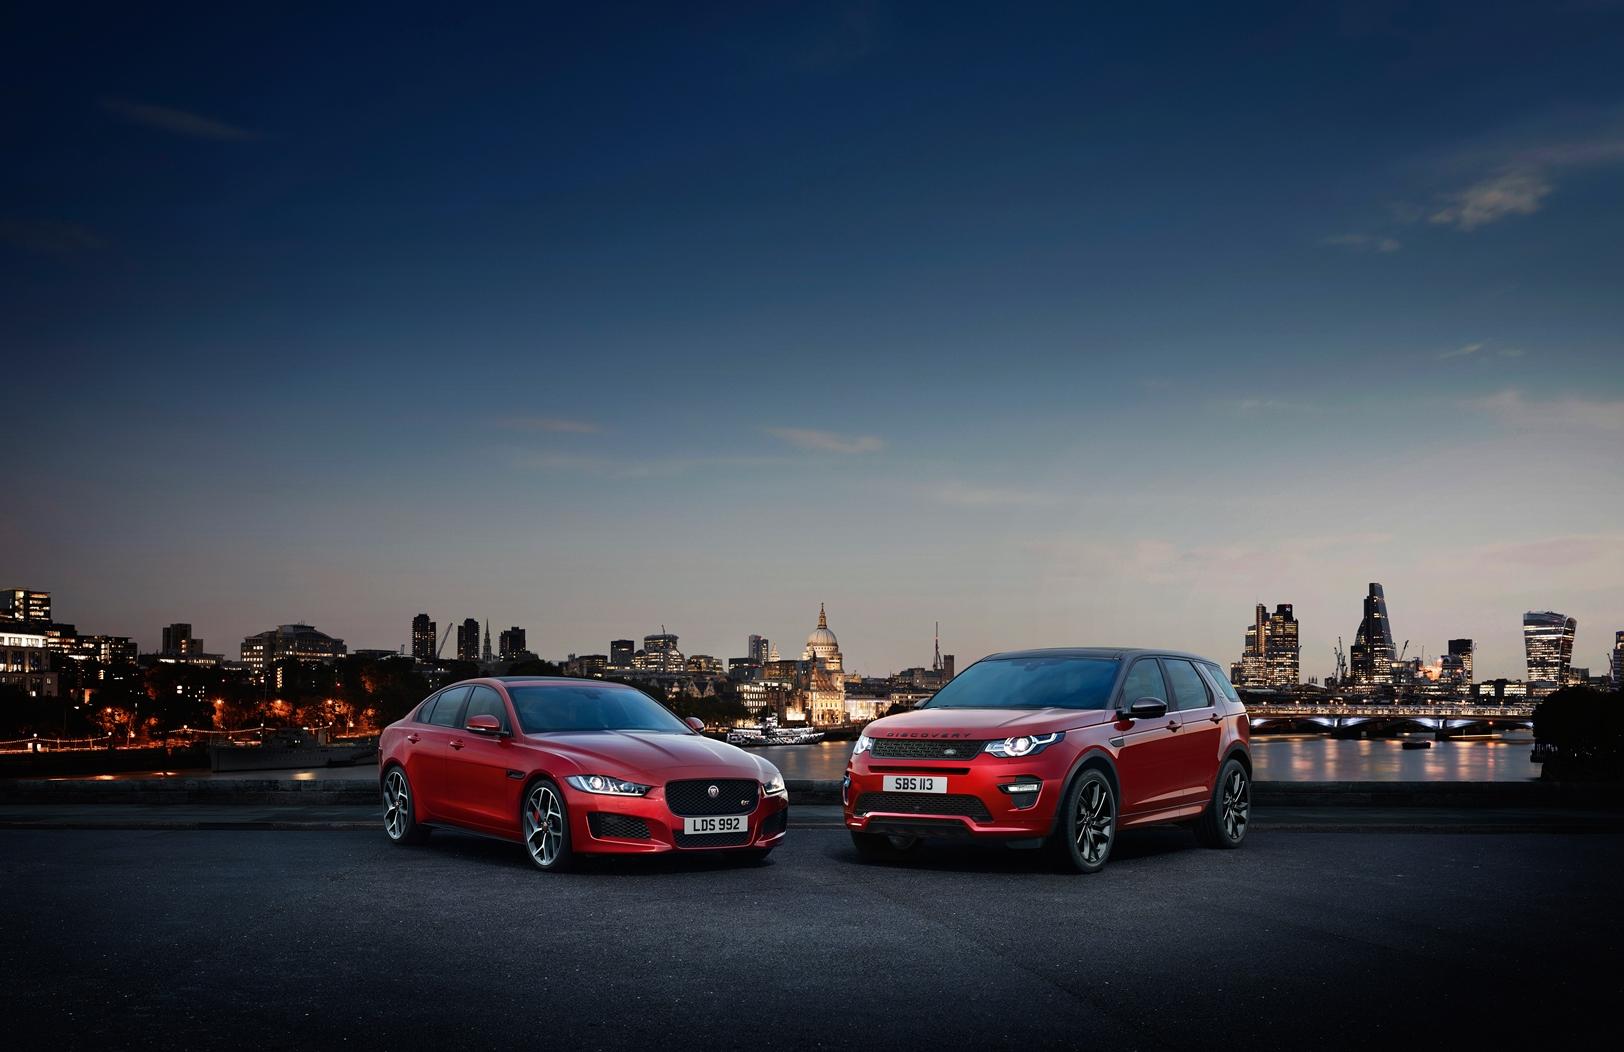 Jaguar Land Rover MotorShow 2016